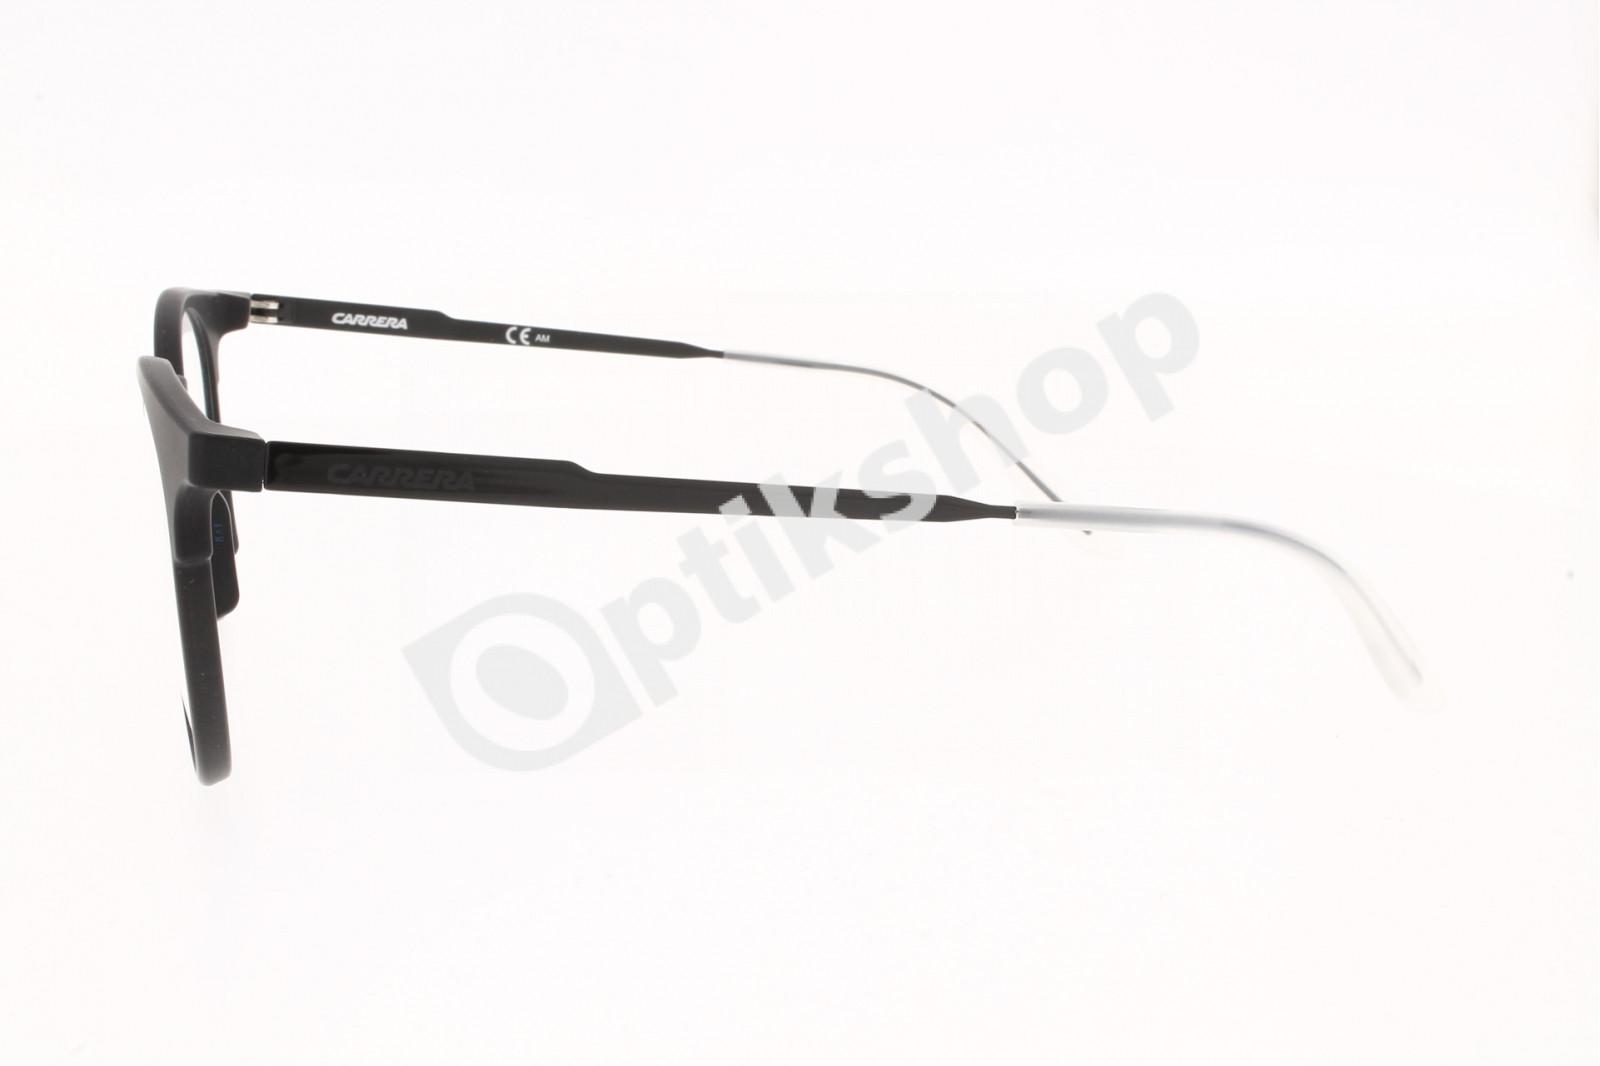 Carrera szemüveg  Carrera szemüveg  Carrera szemüveg 9476526b92